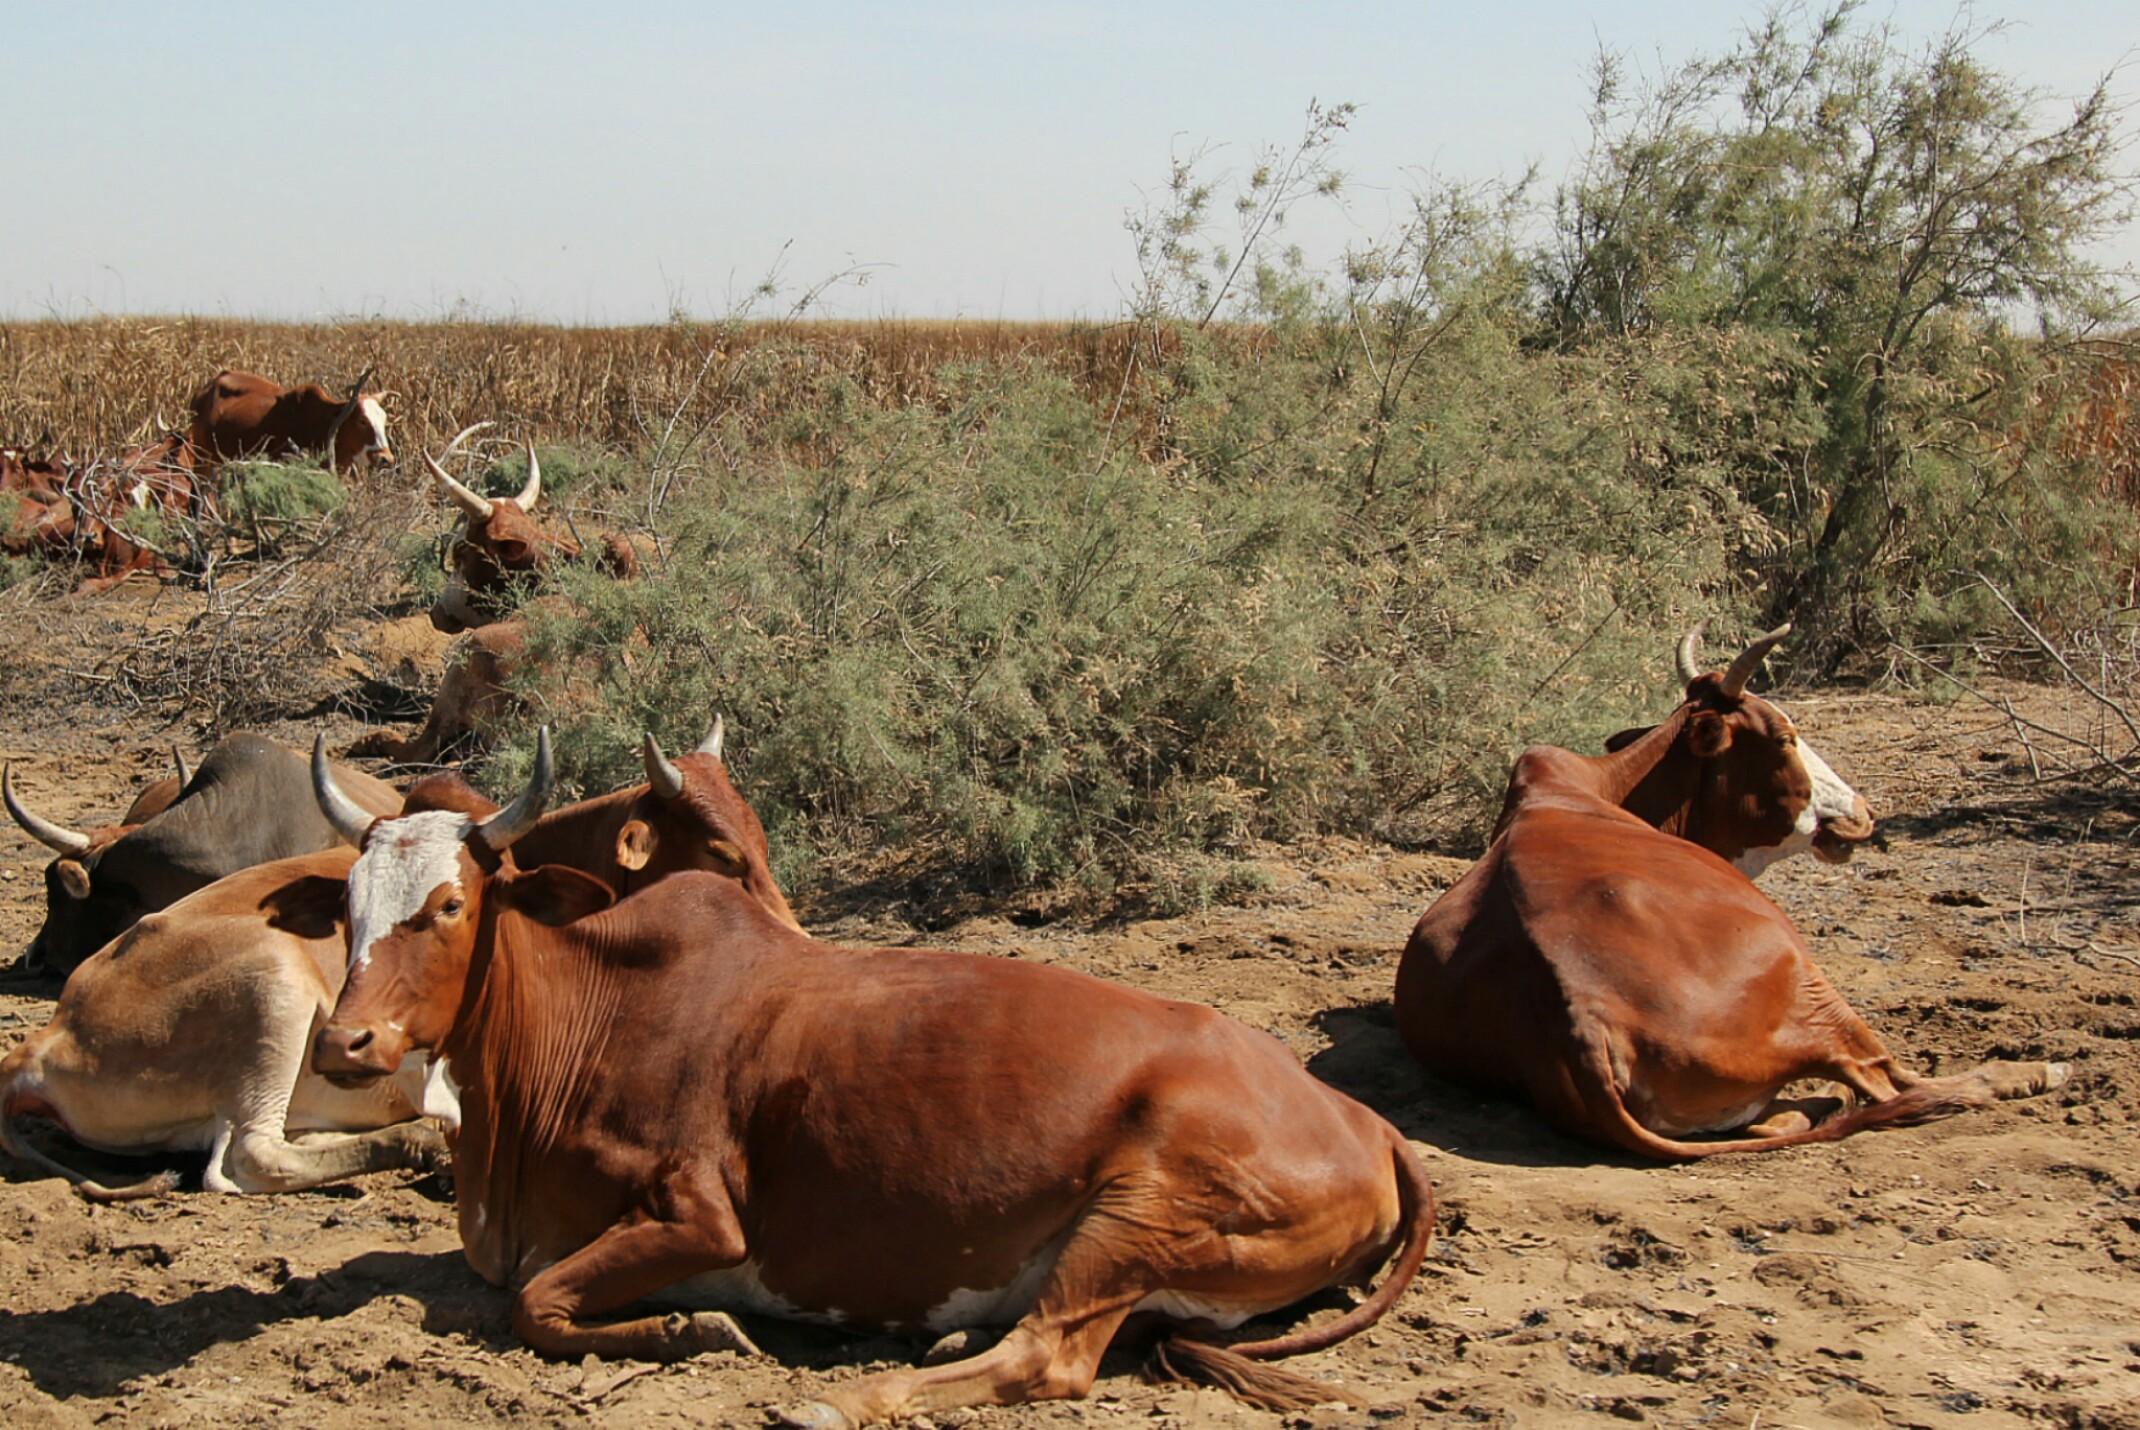 Mauretania, Parc National du Diawling